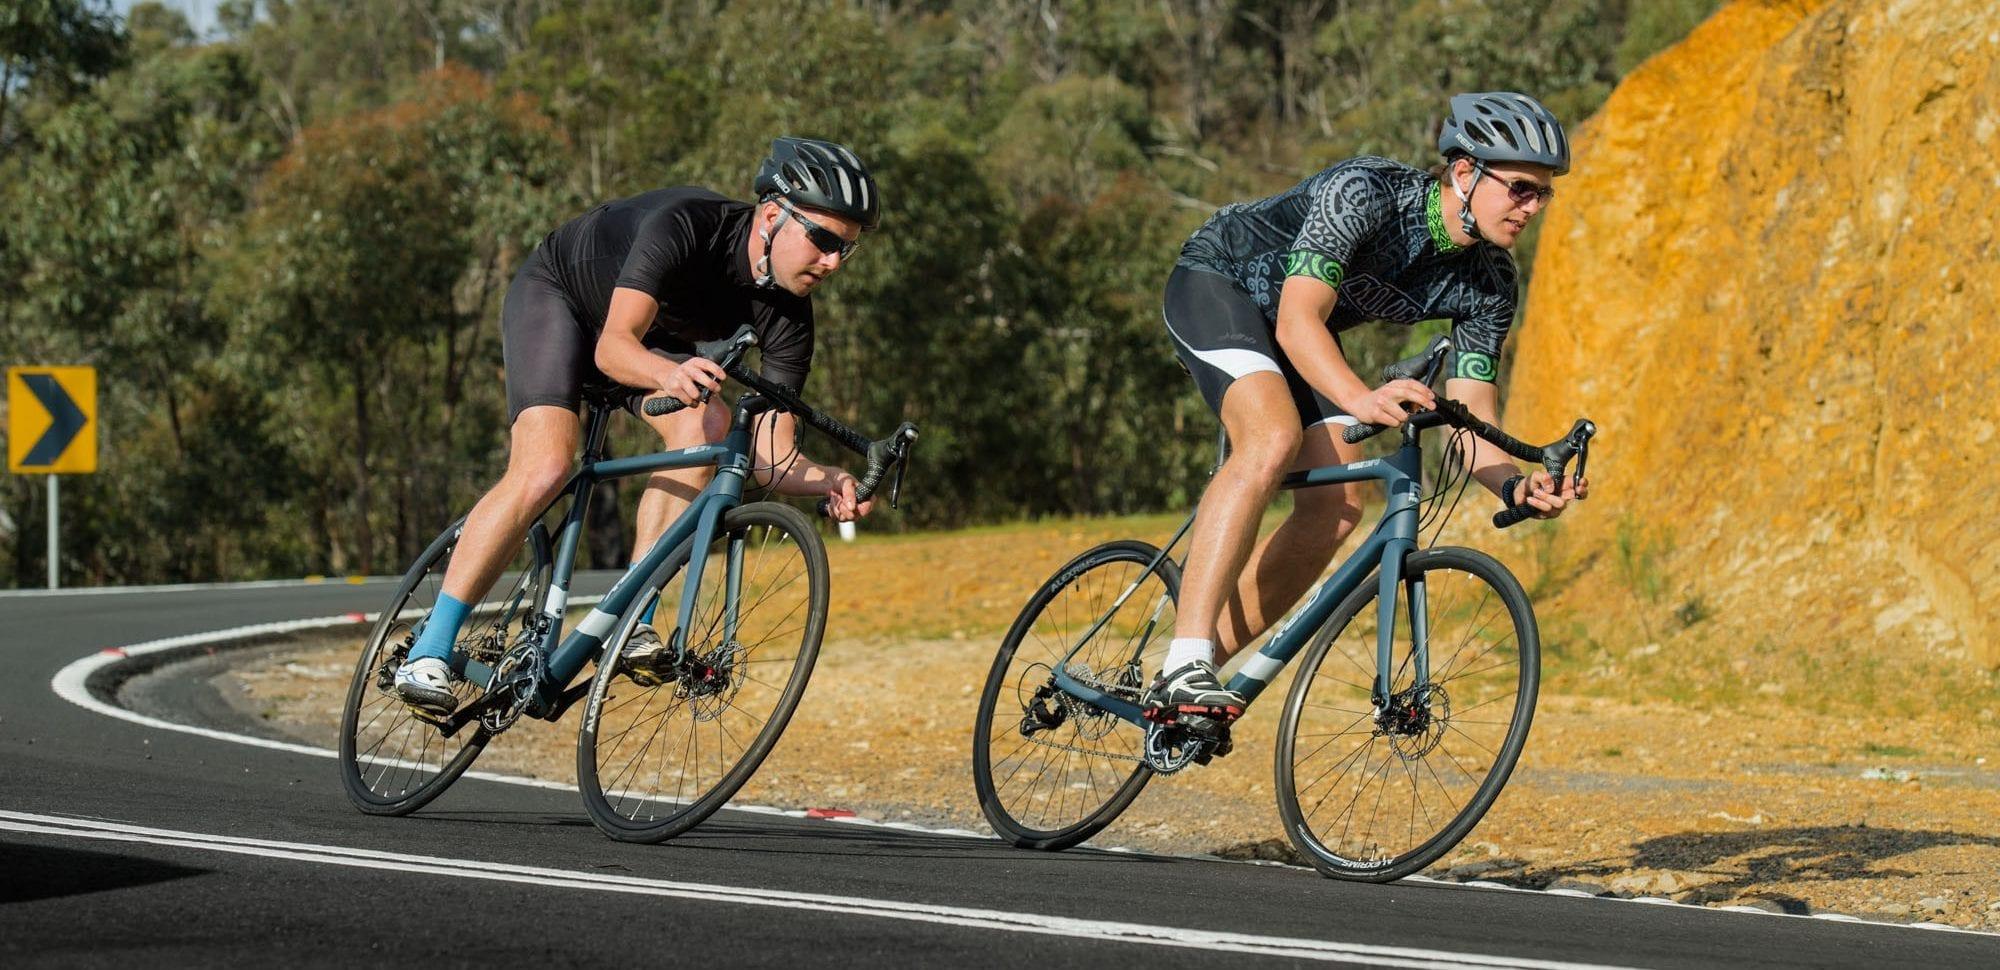 2 Reid road bikes bending